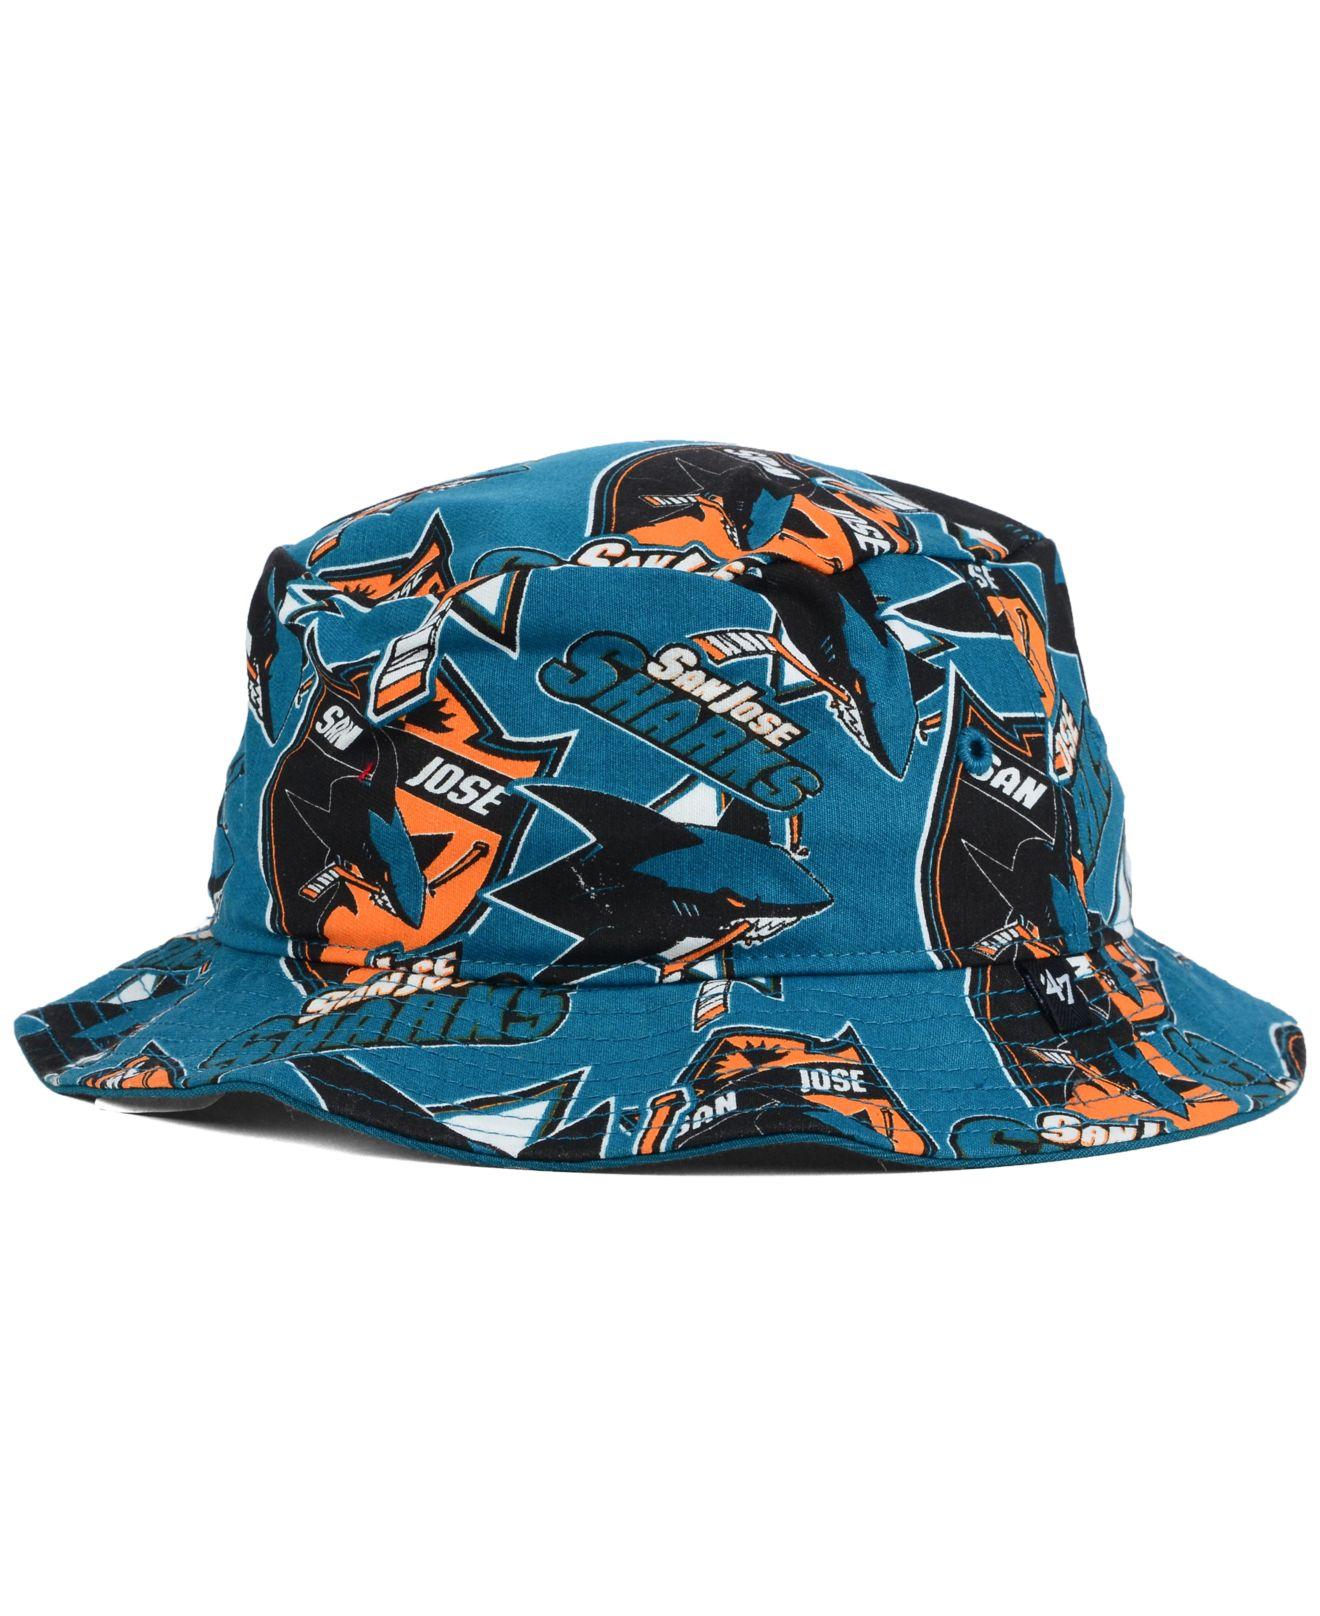 fb8ad73e882 Lyst - 47 Brand San Jose Sharks Bucket Hat in Blue